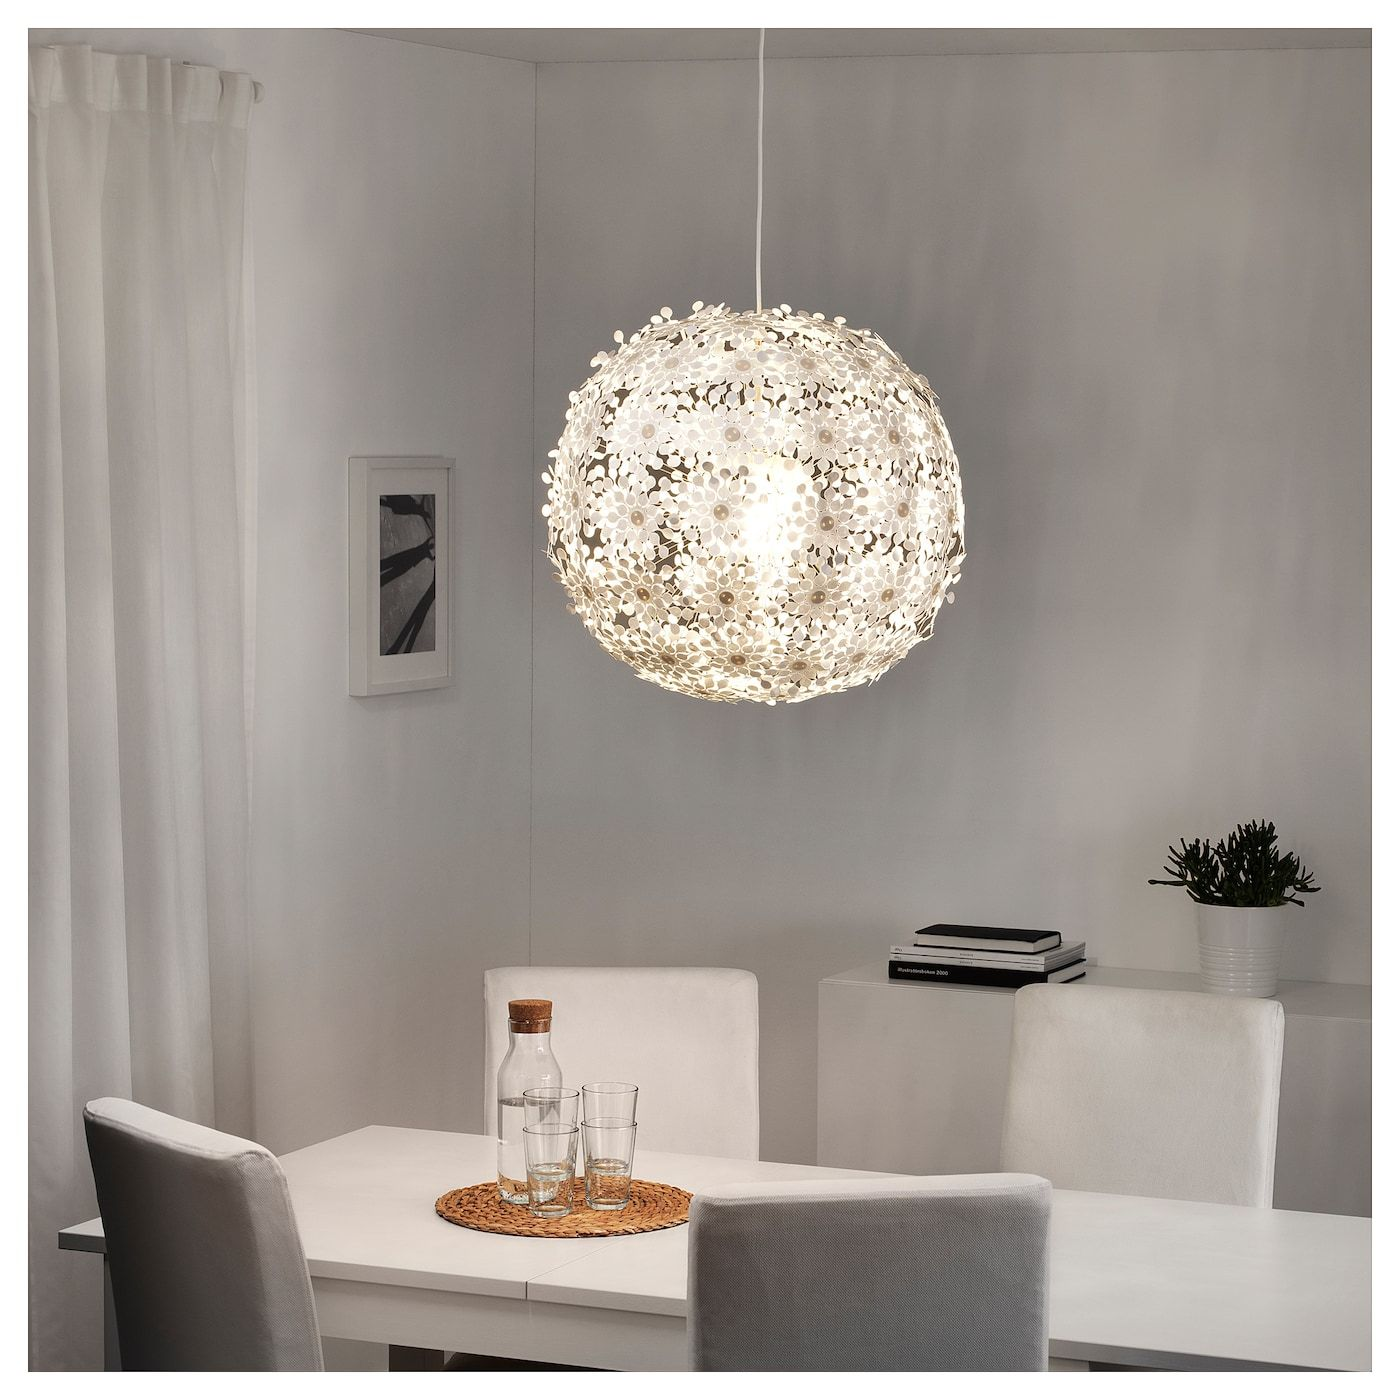 Grimsas Pendant Lamp White 22 White Pendant Lamp Pendant